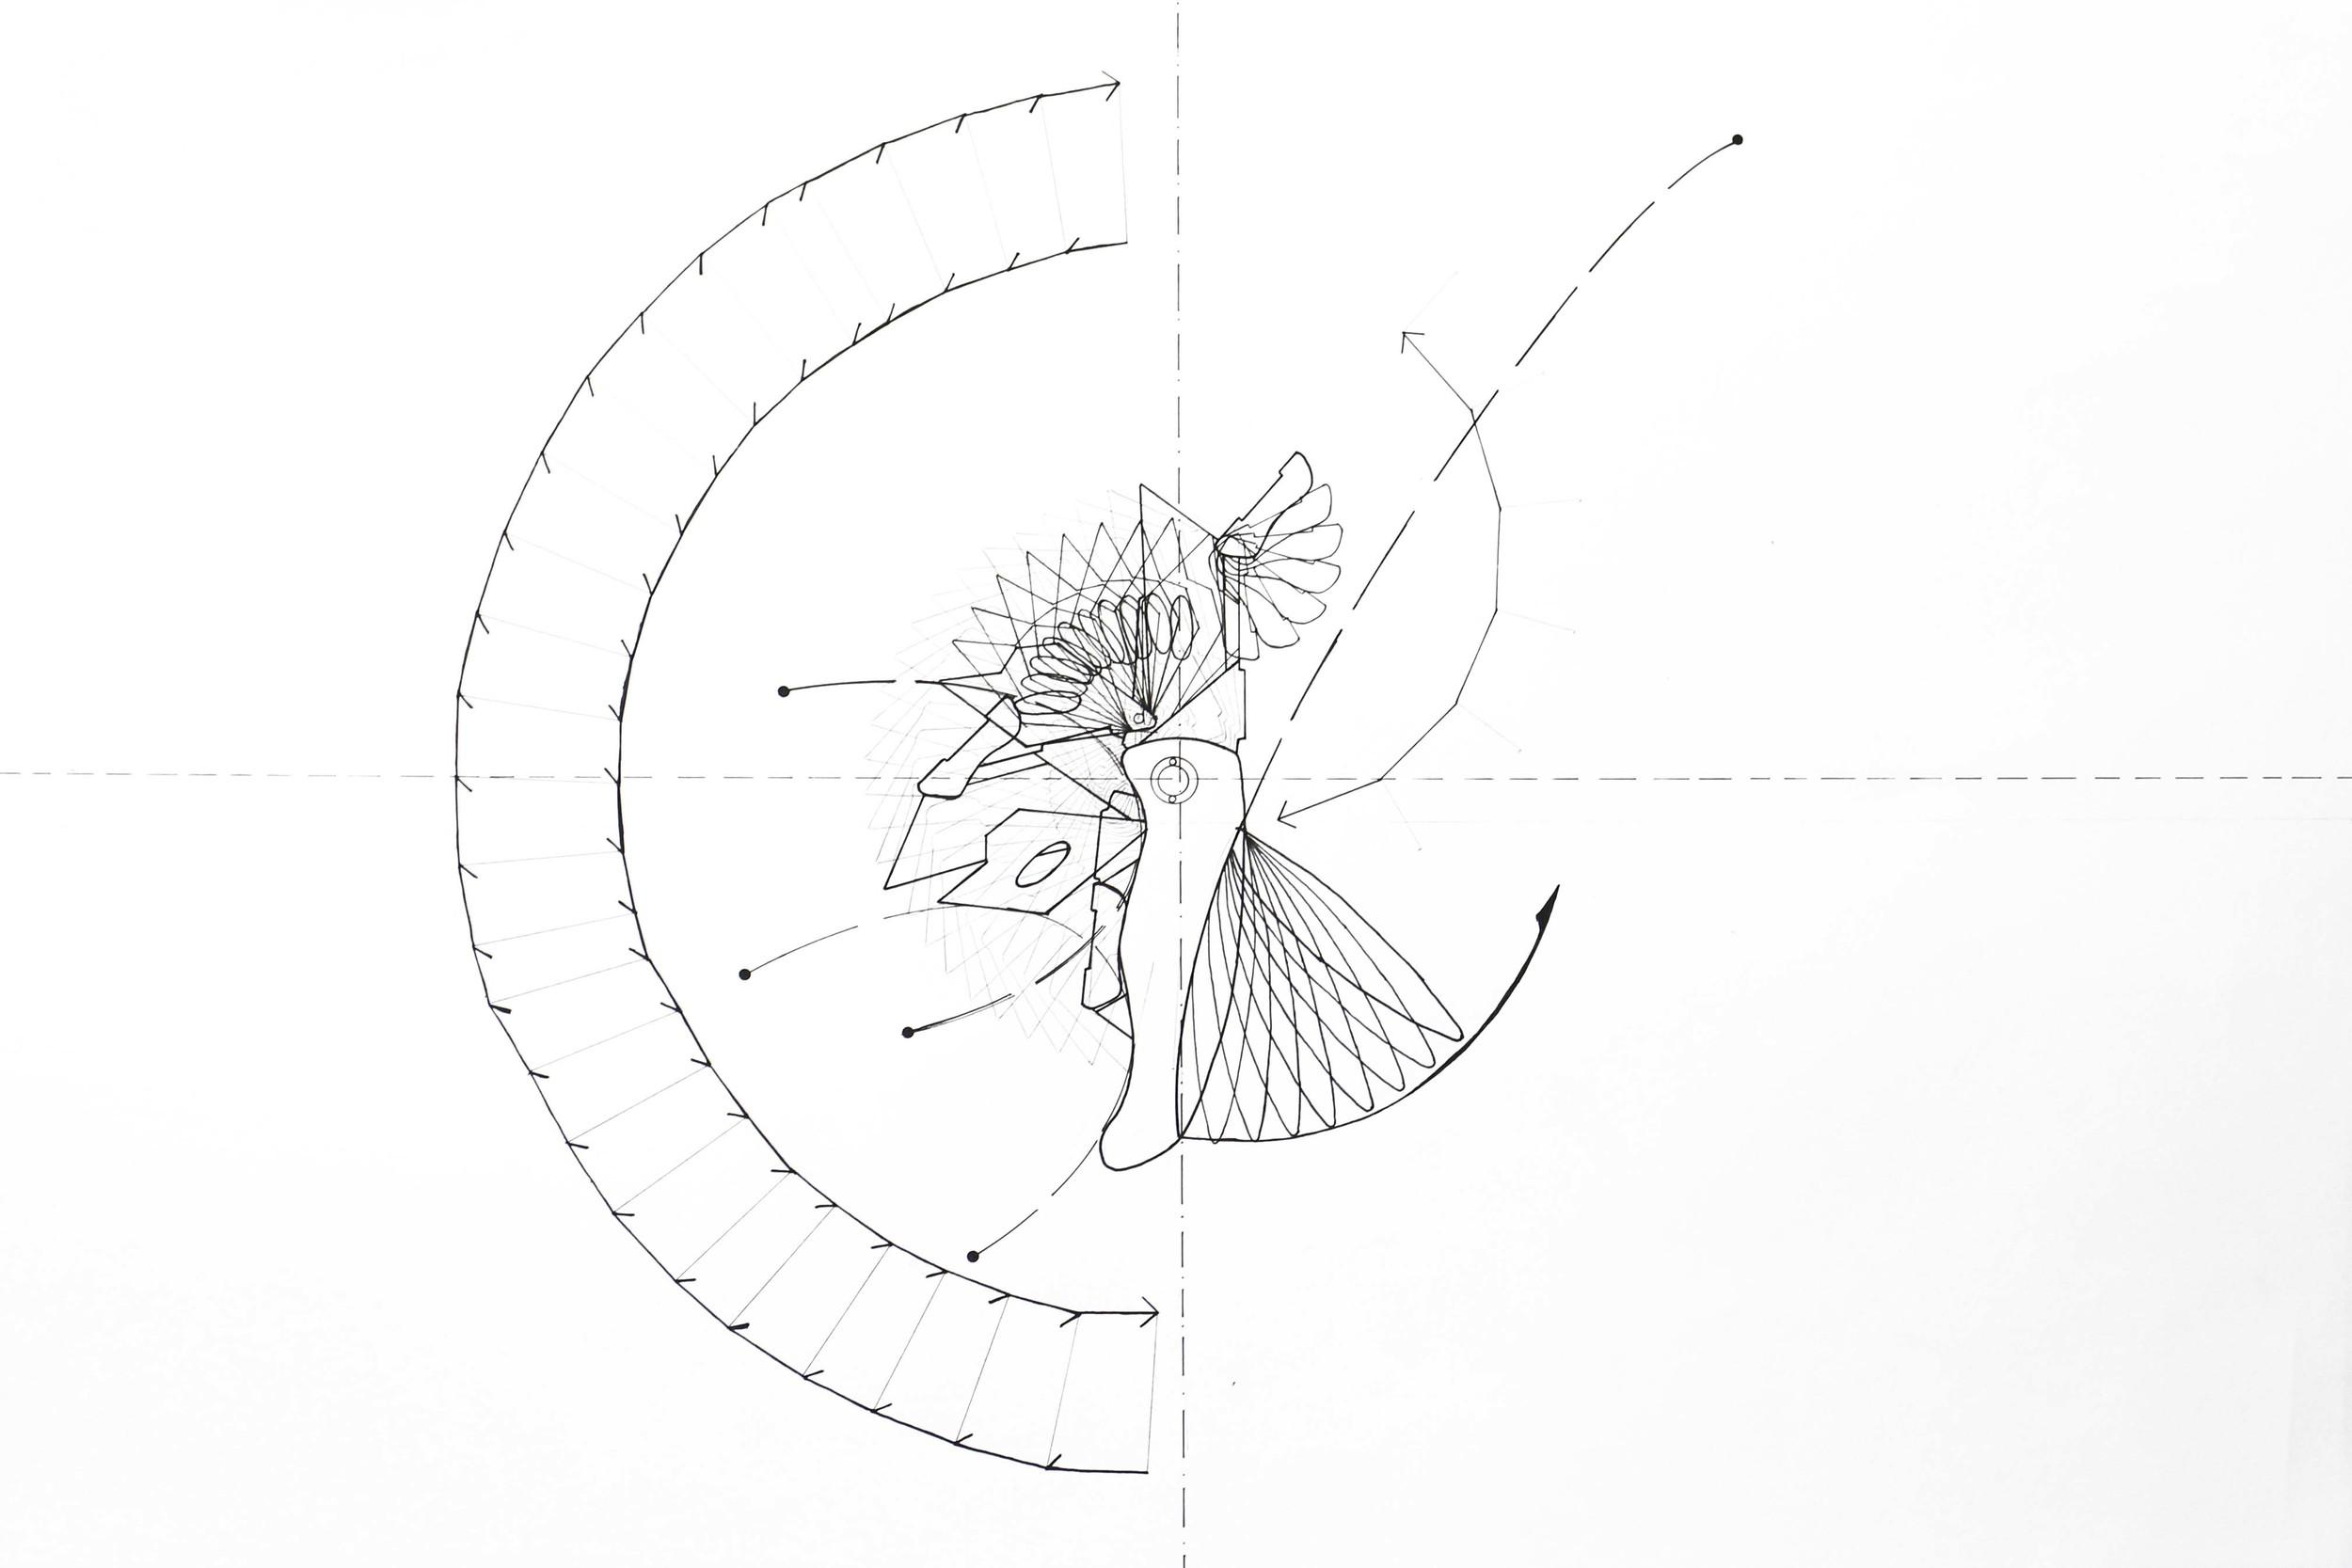 Darstellung II - Dynamik & Funktion Autor:Batuhan Eyyüp Gugeler